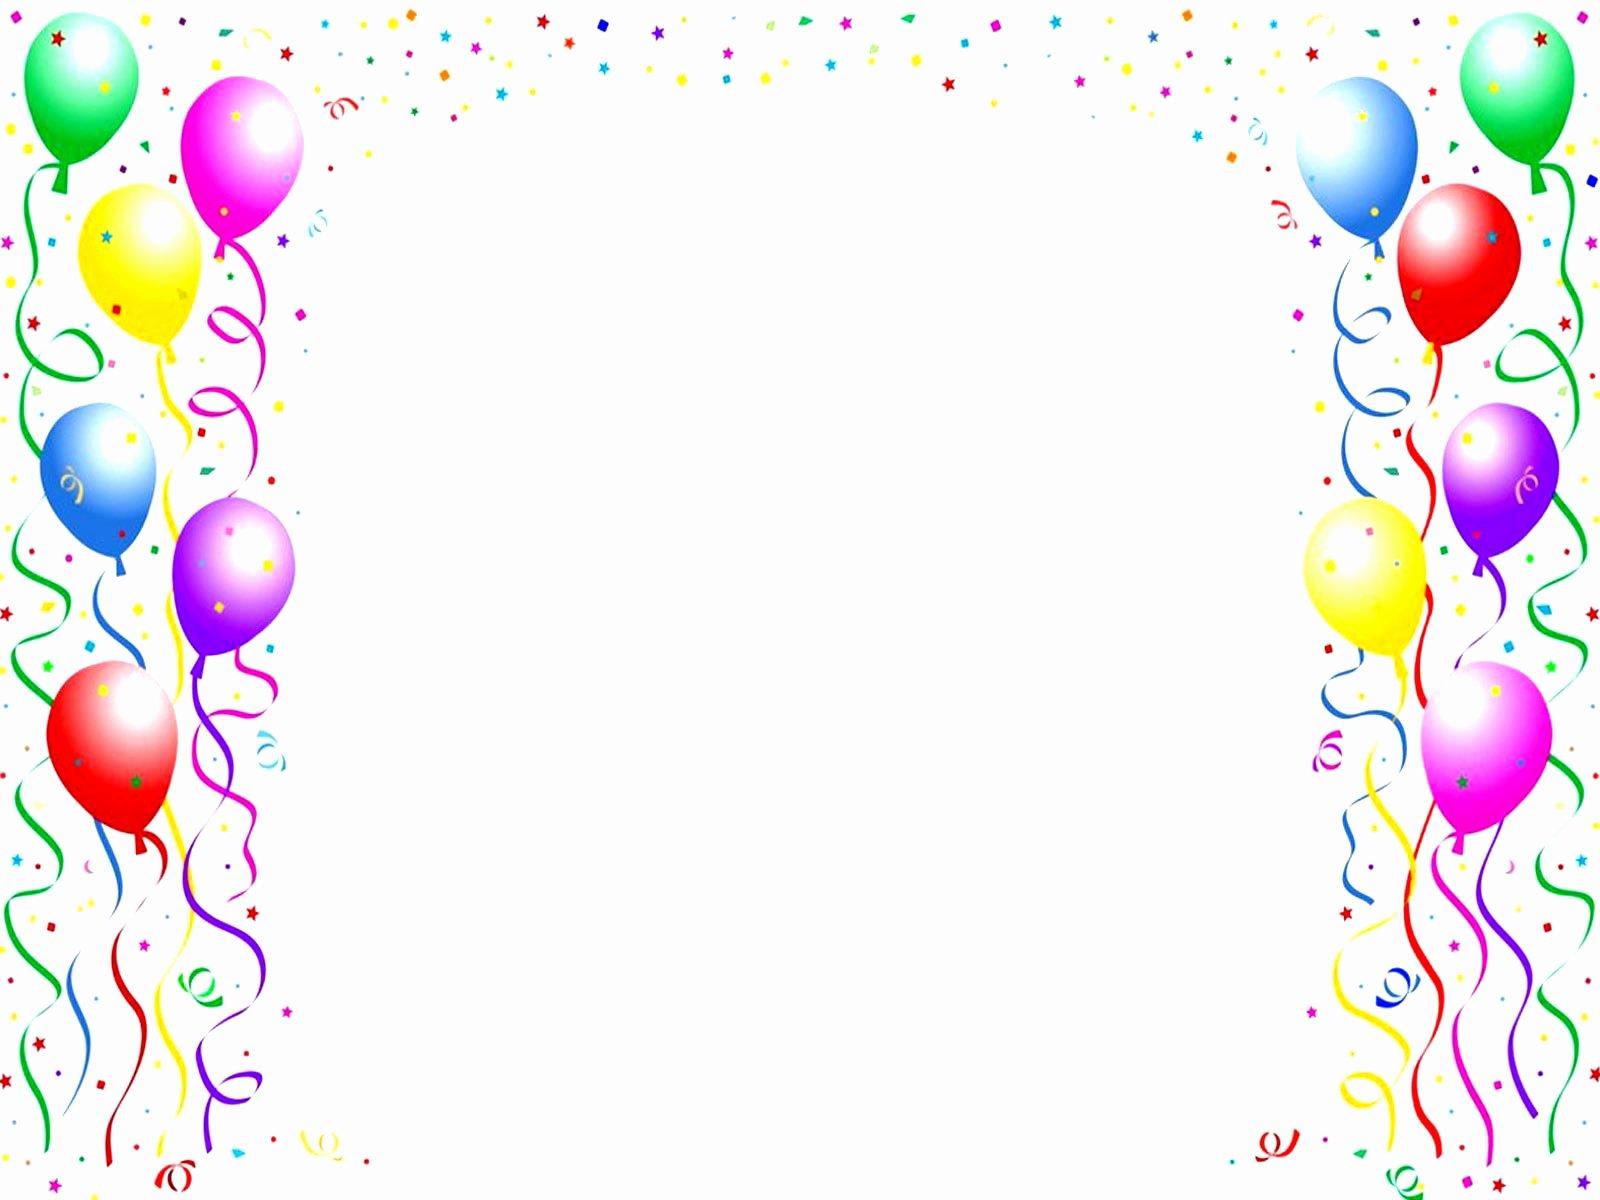 Happy Birthday Template Word Beautiful Happy Birthday Template Word – Happy Holidays